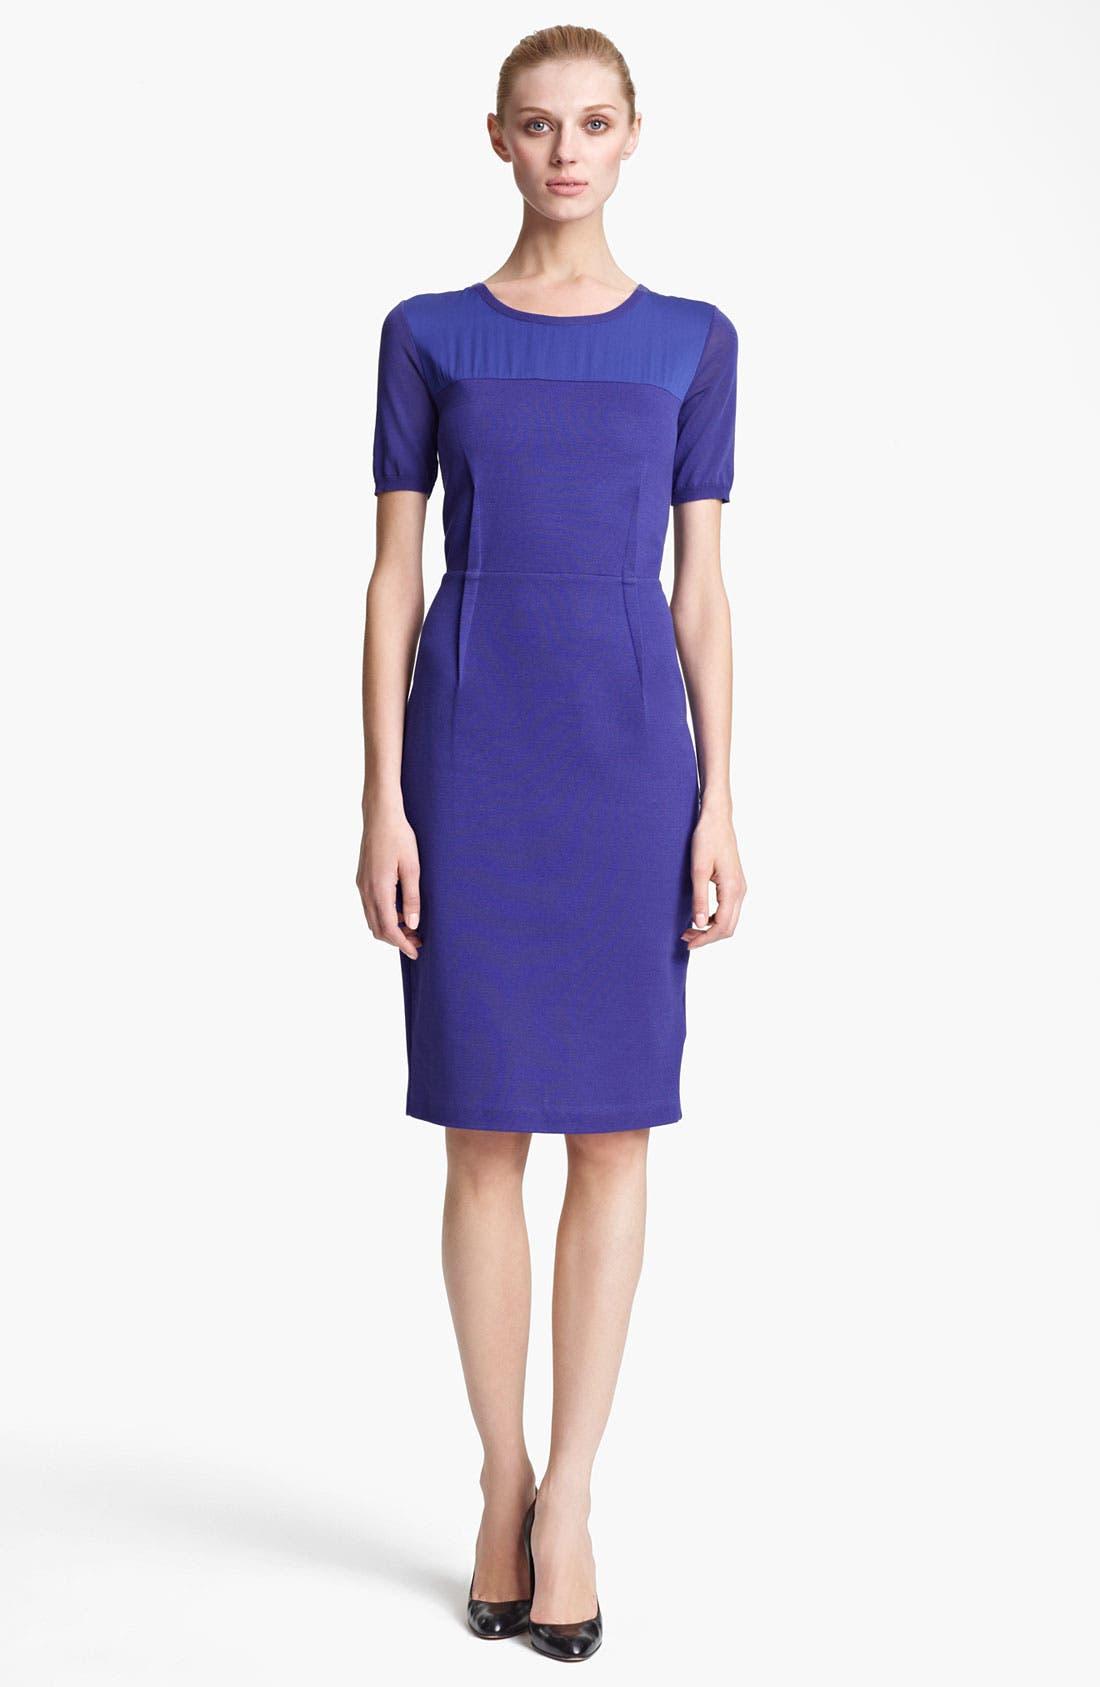 Alternate Image 1 Selected - Max Mara Techno Knit & Jersey Dress